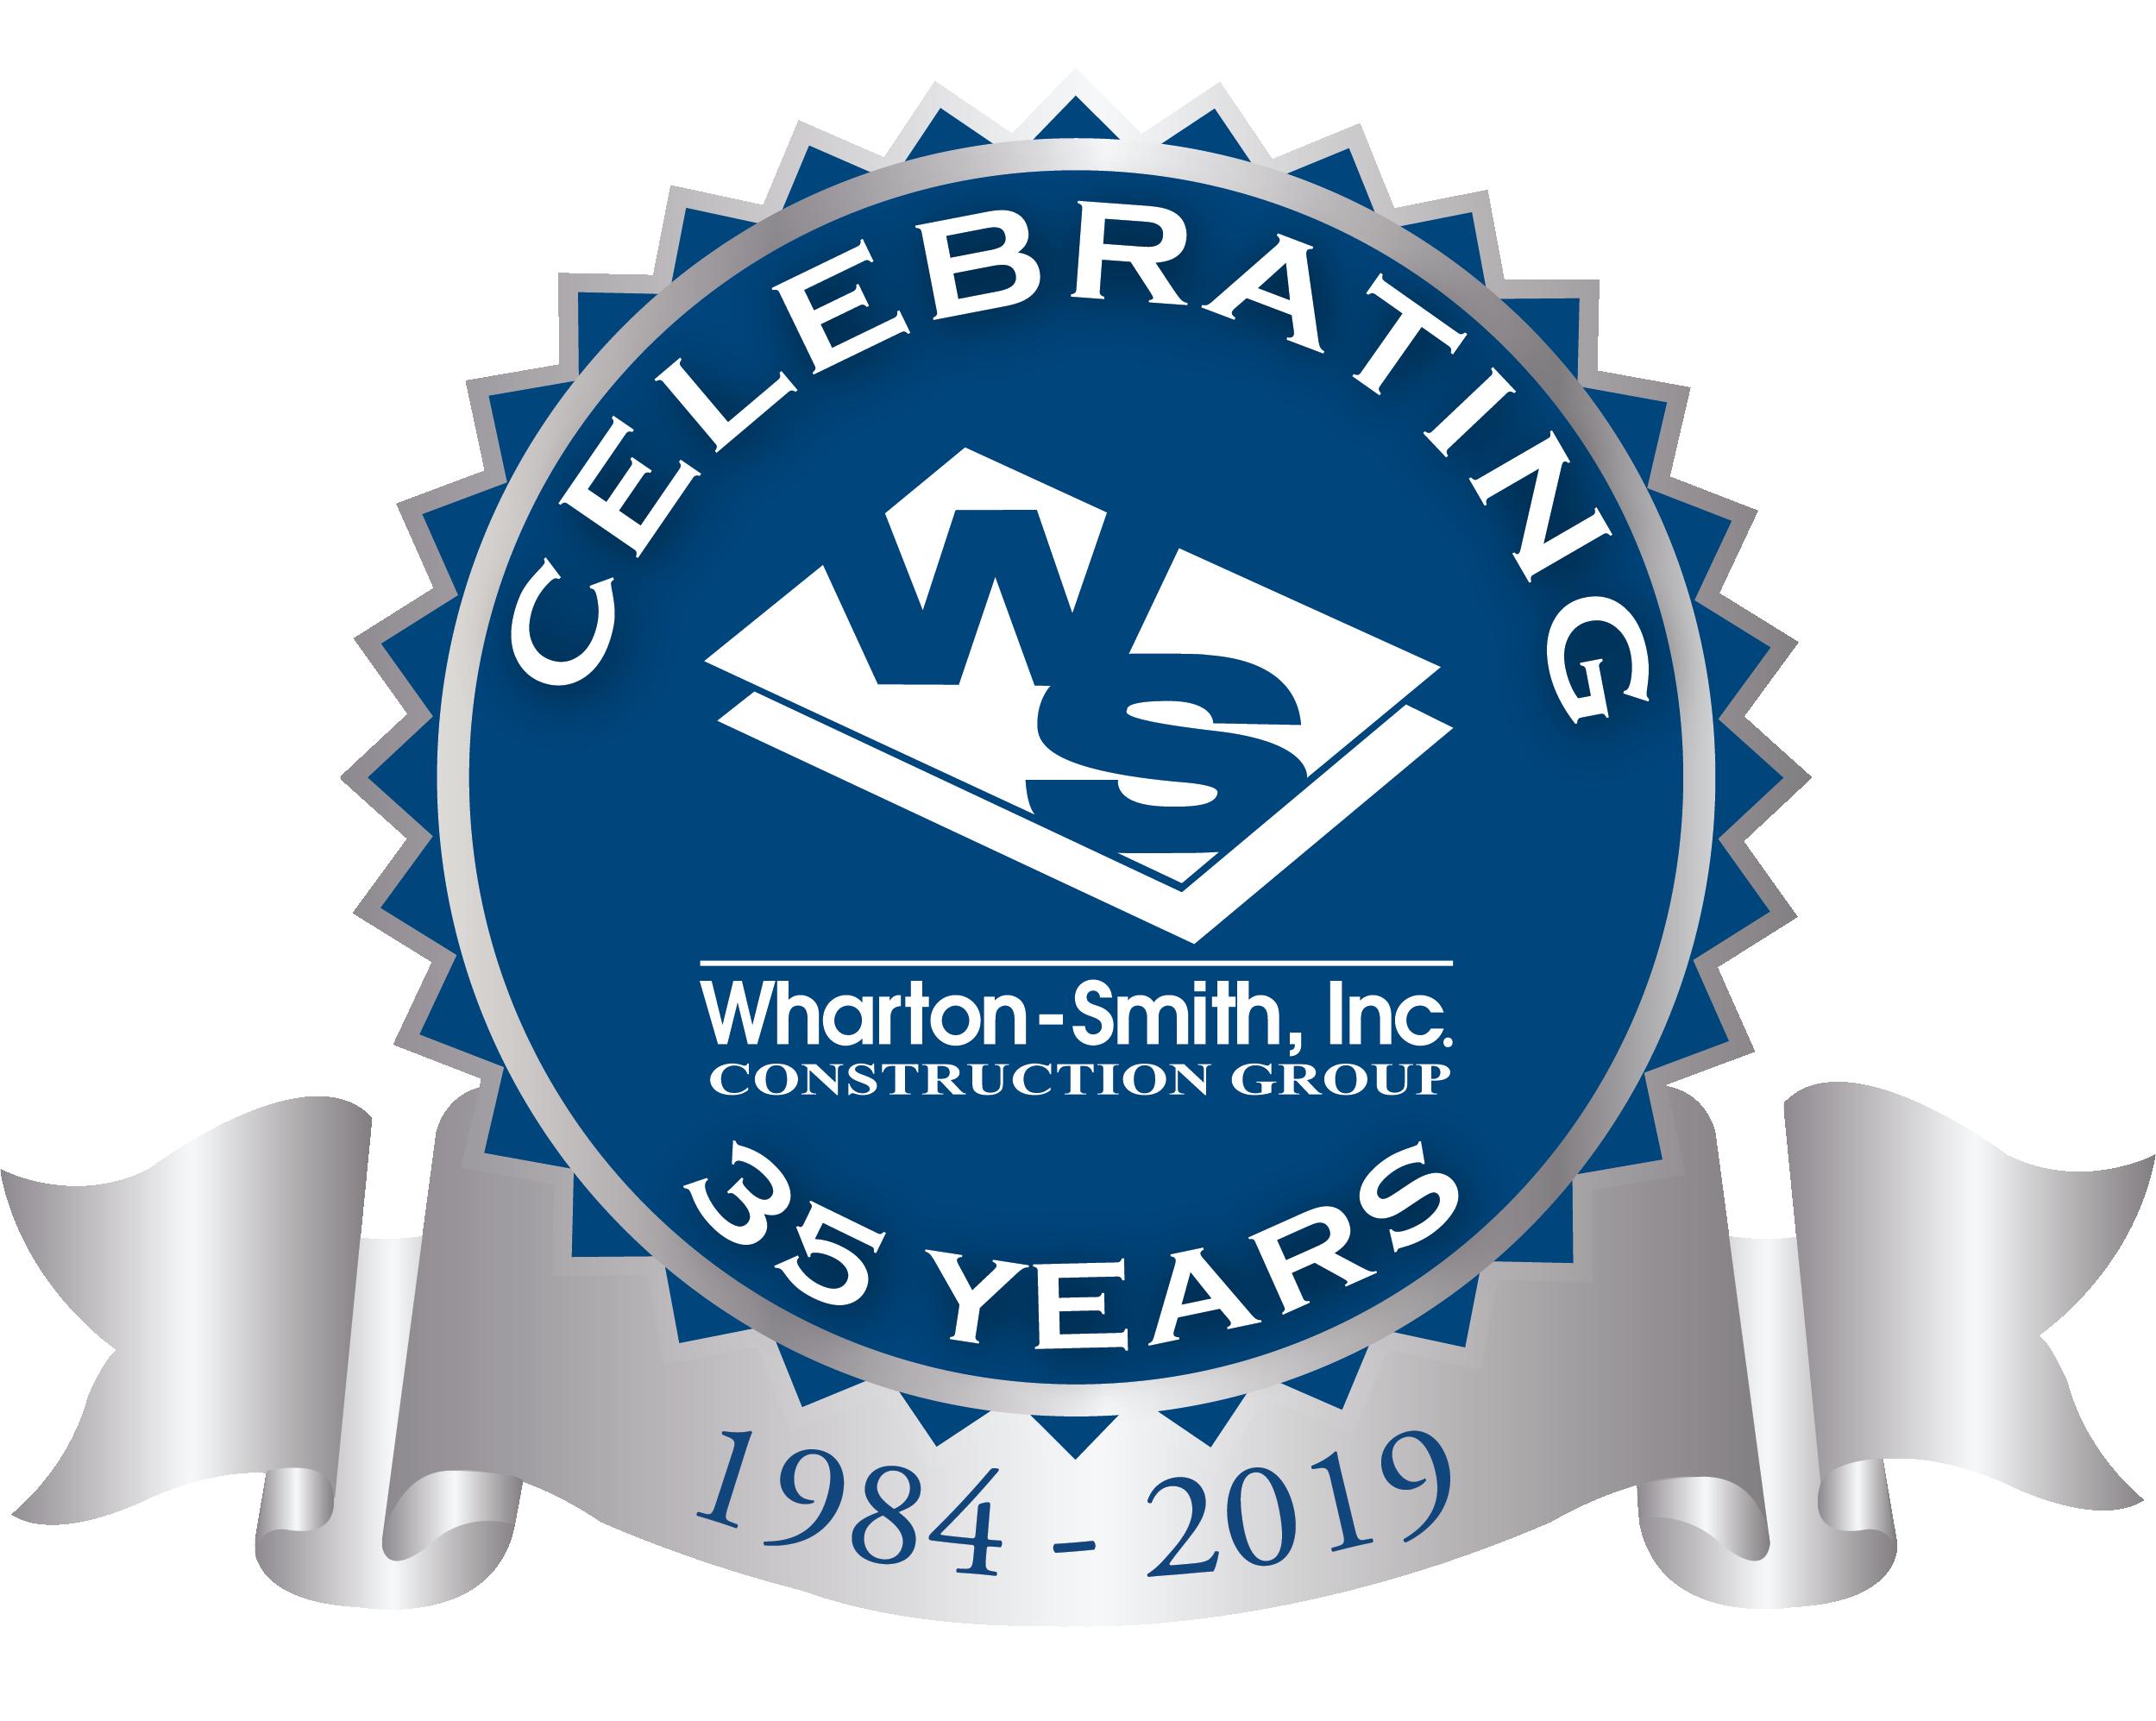 Wharton PNG Logo, Free Download.